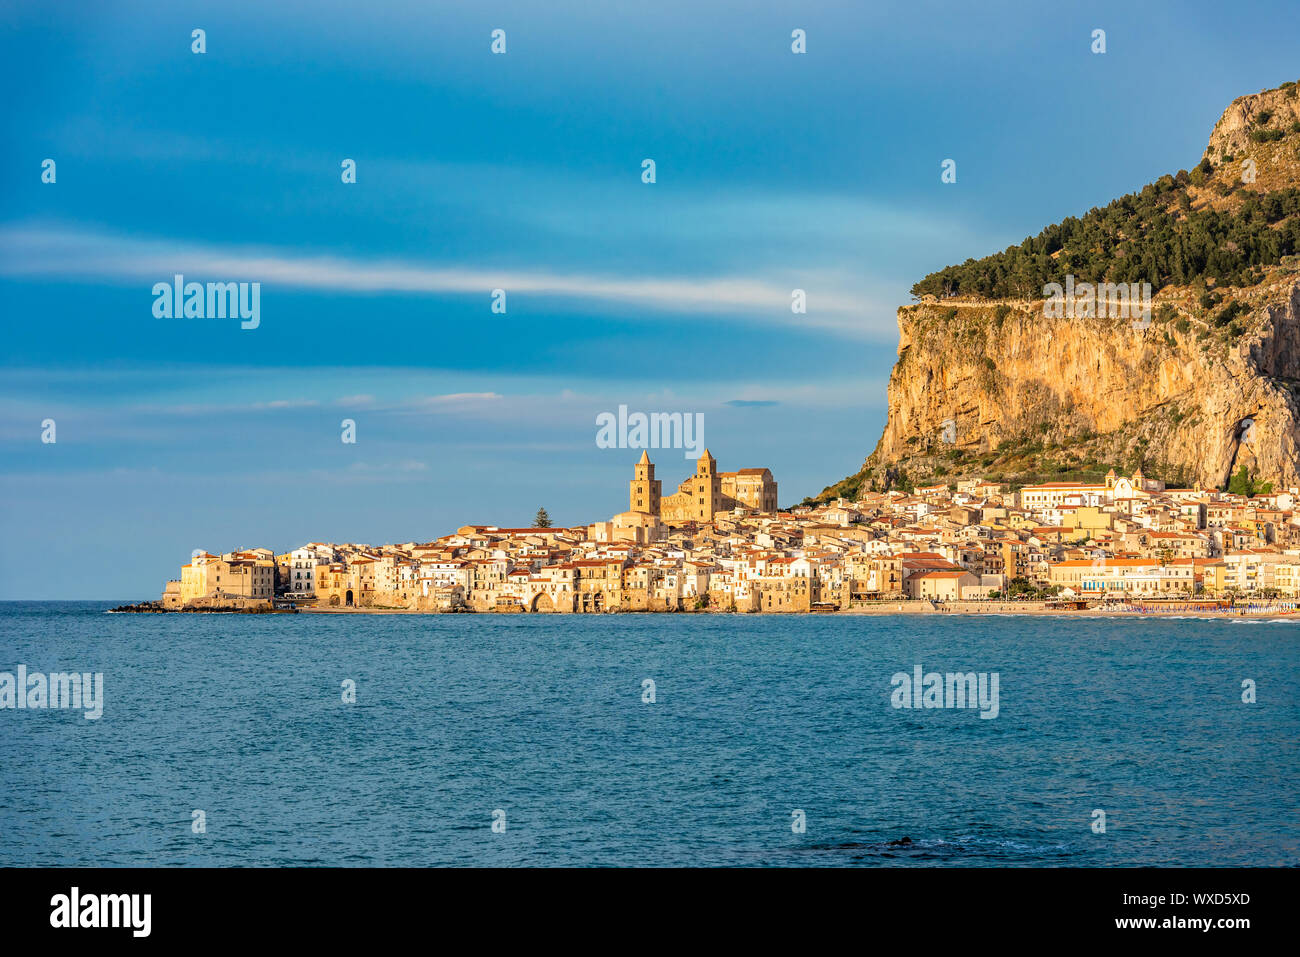 Cefalu, medieval village of Sicily island, Italy Stock Photo